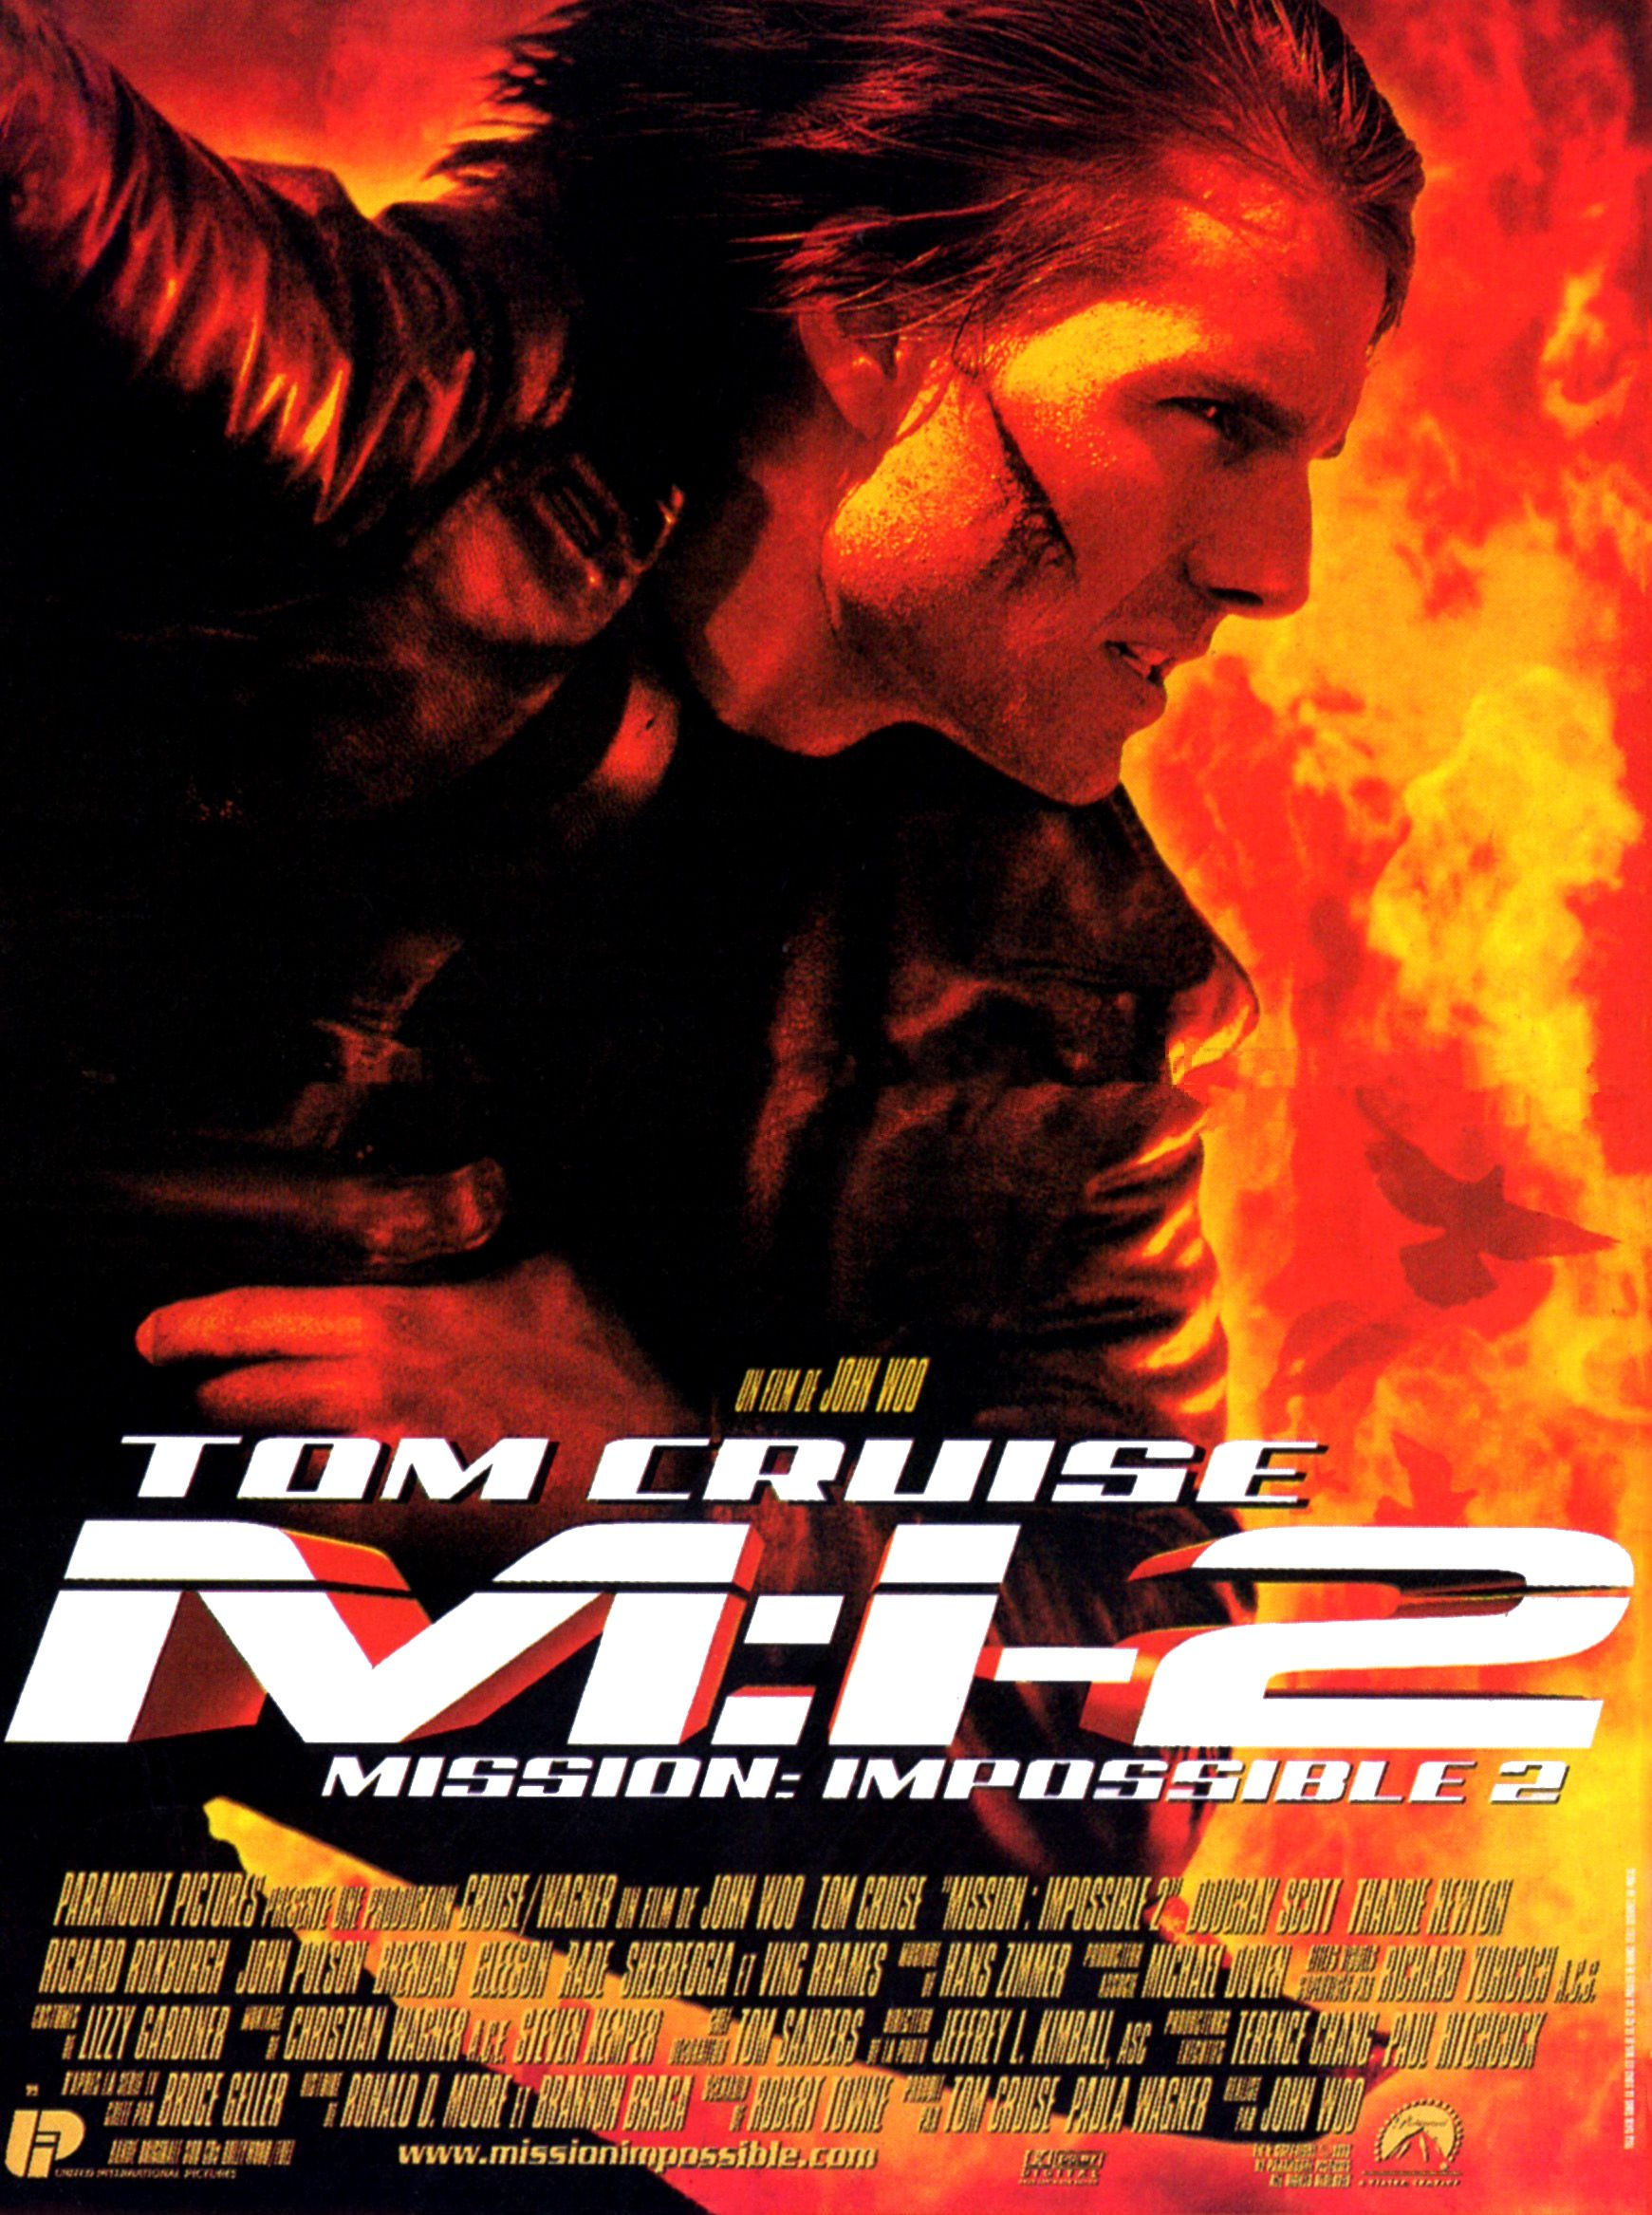 Mission : impossible 2 (2000) de John Woo